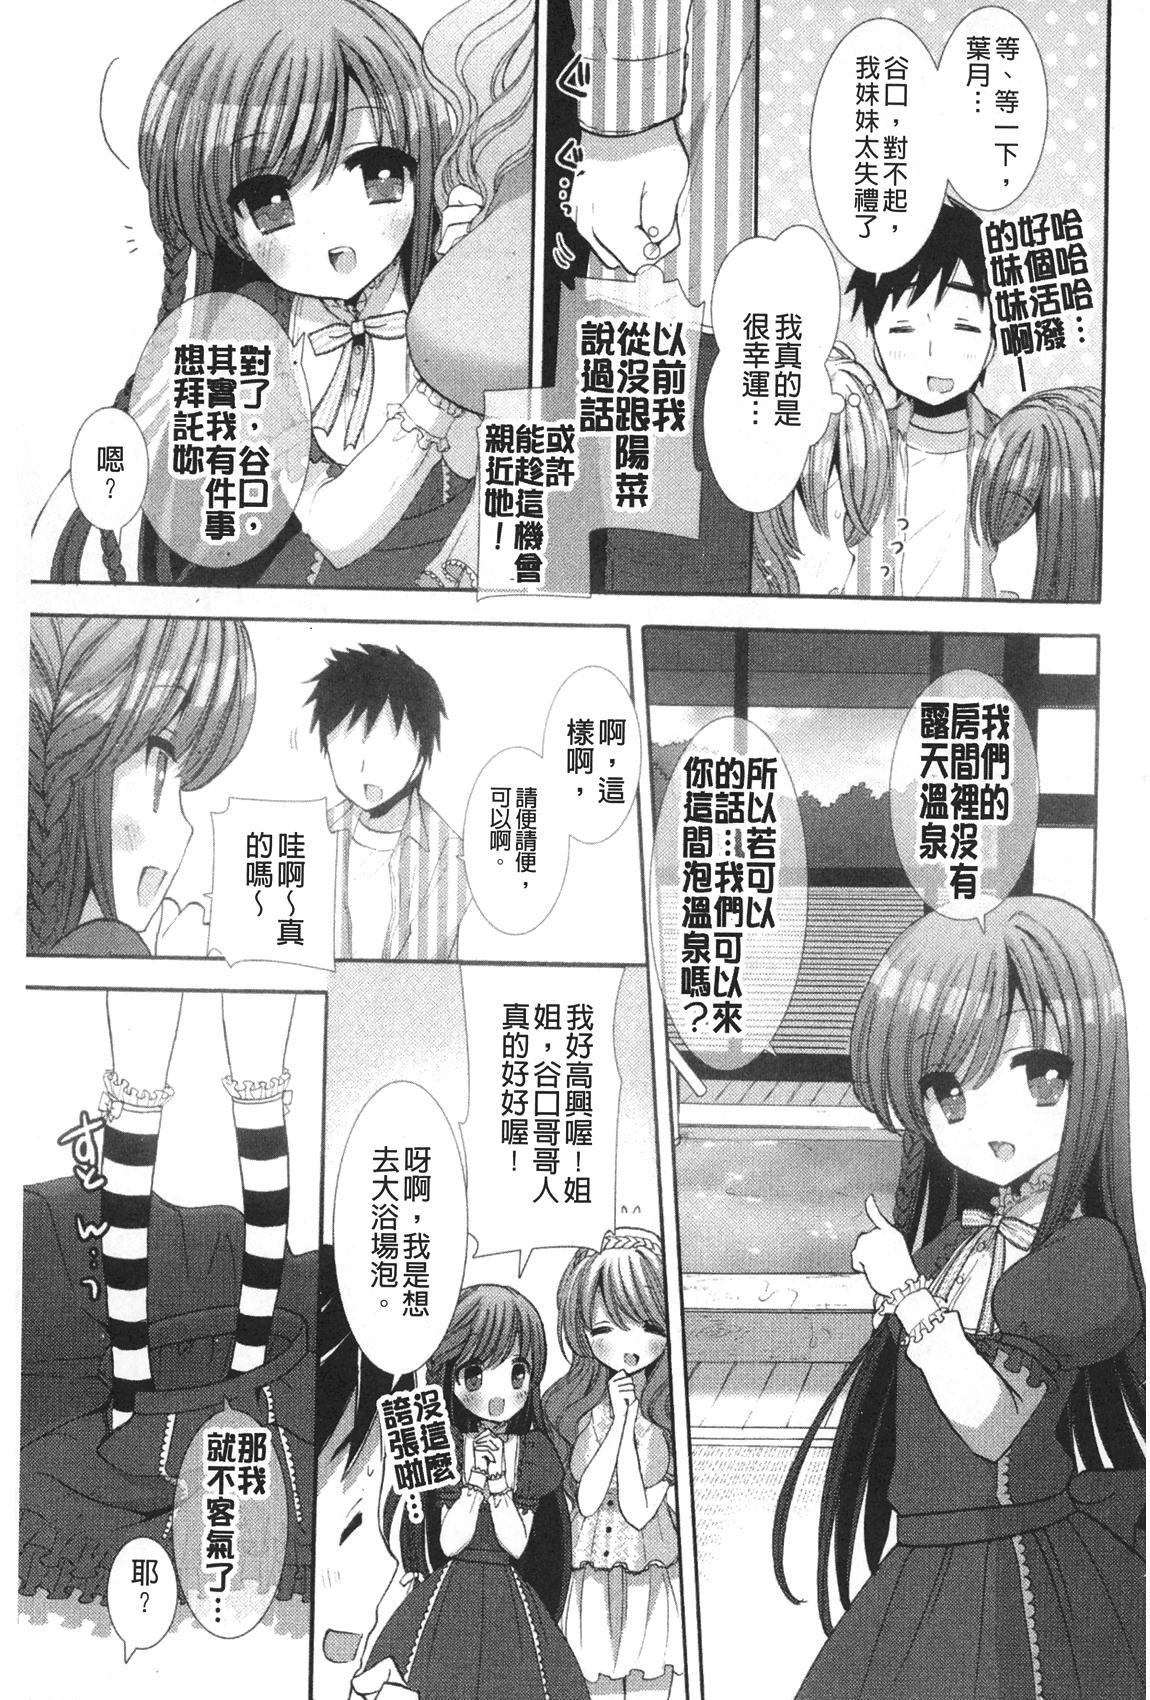 Icha Love! | 稚嫩女之愛! 163